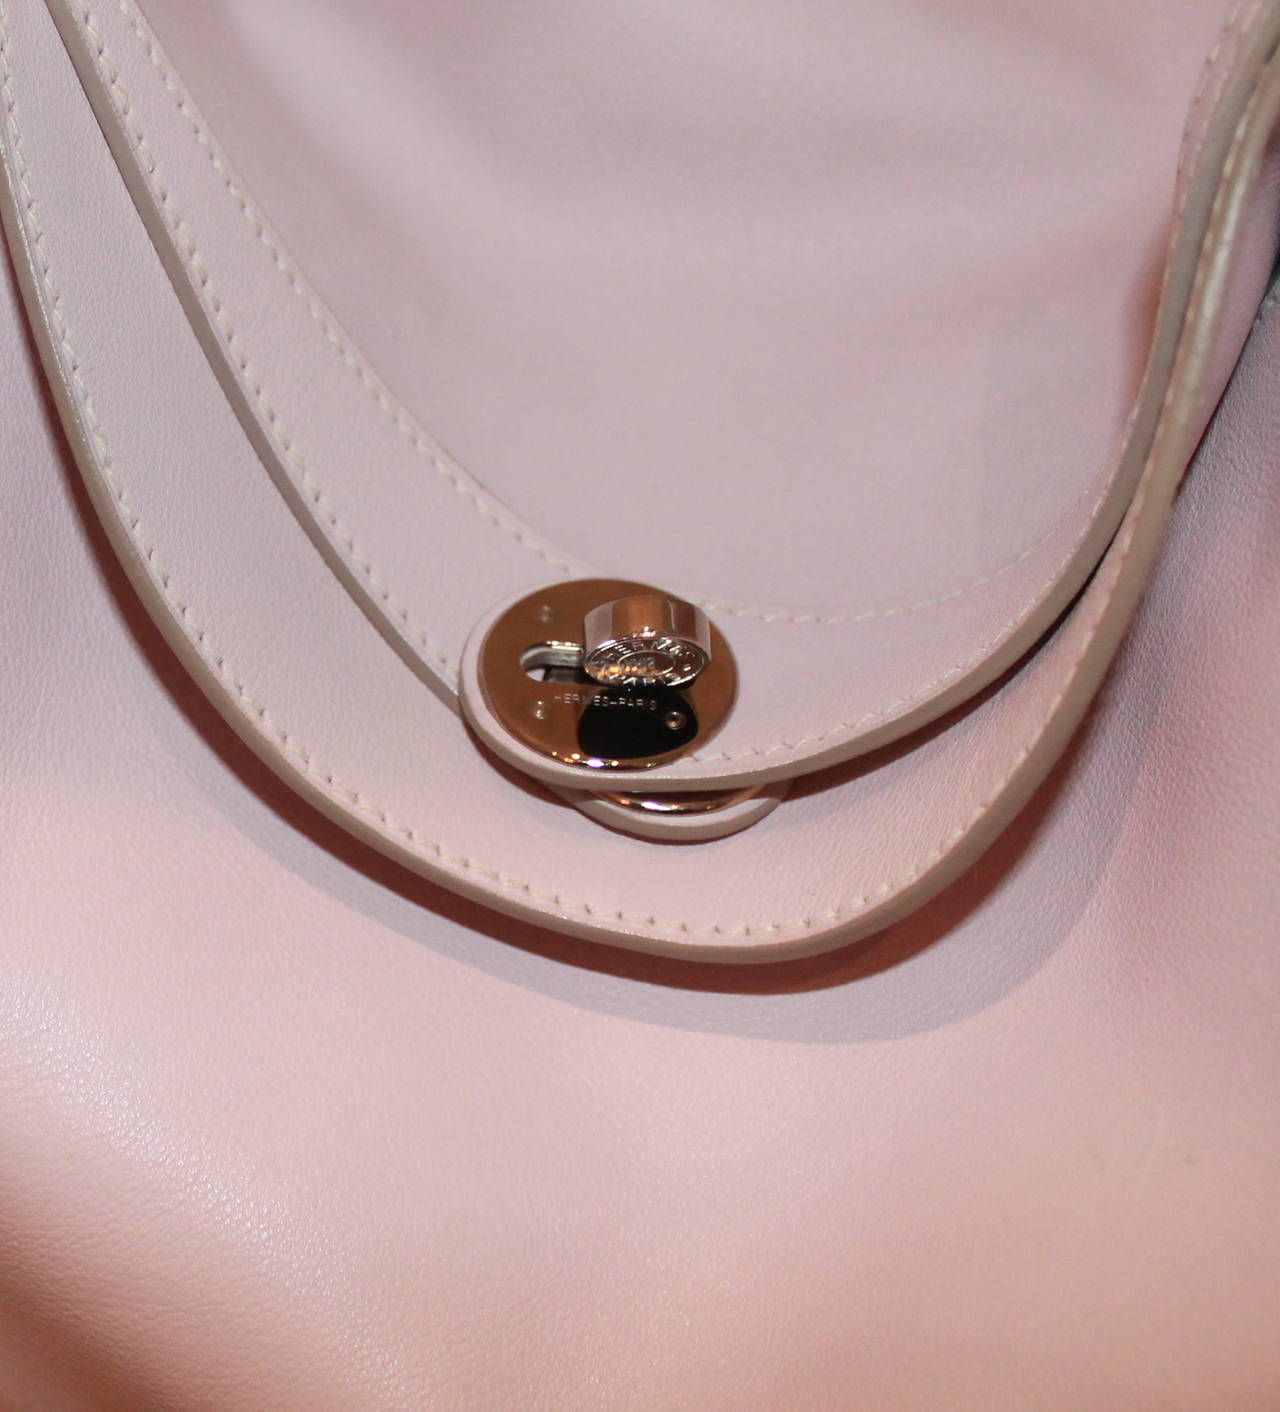 Hermes Rose Dragee 30cm Lindy Veau Swift Handbag - circa 2007 3